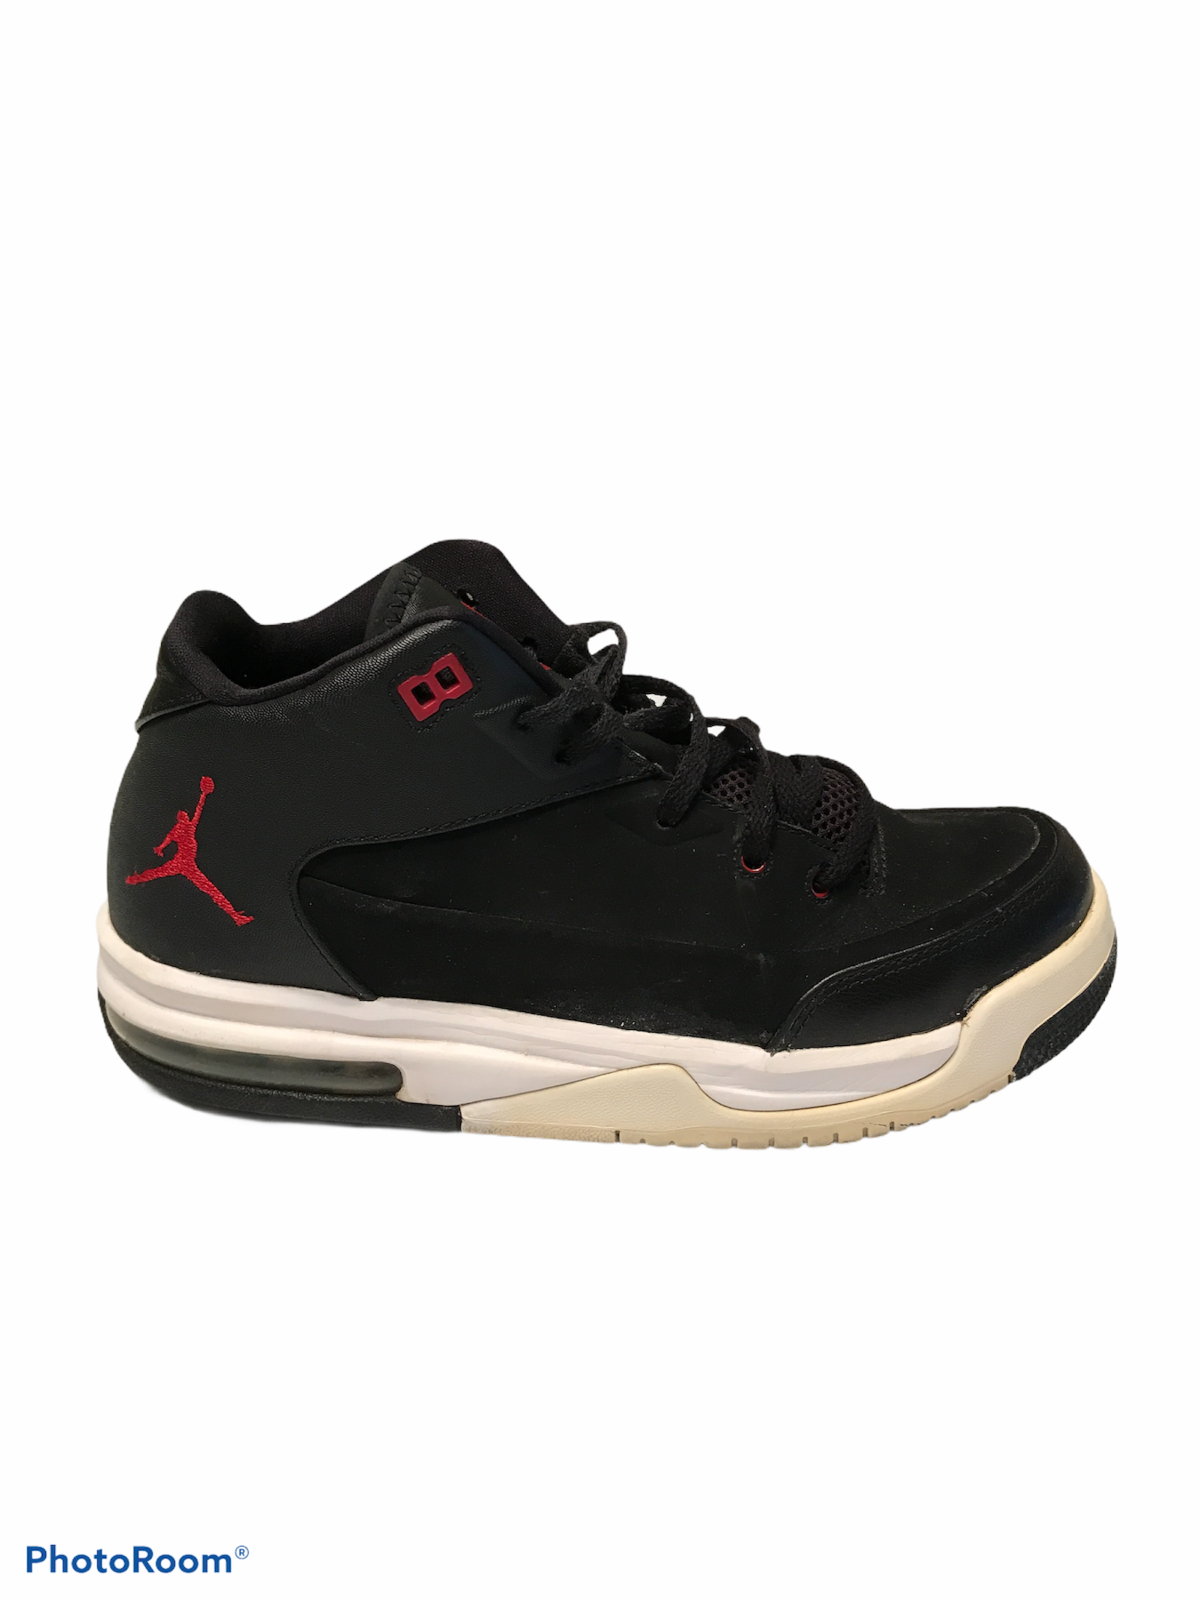 Nike Jordan Flight Origin 3 Size 6.5y